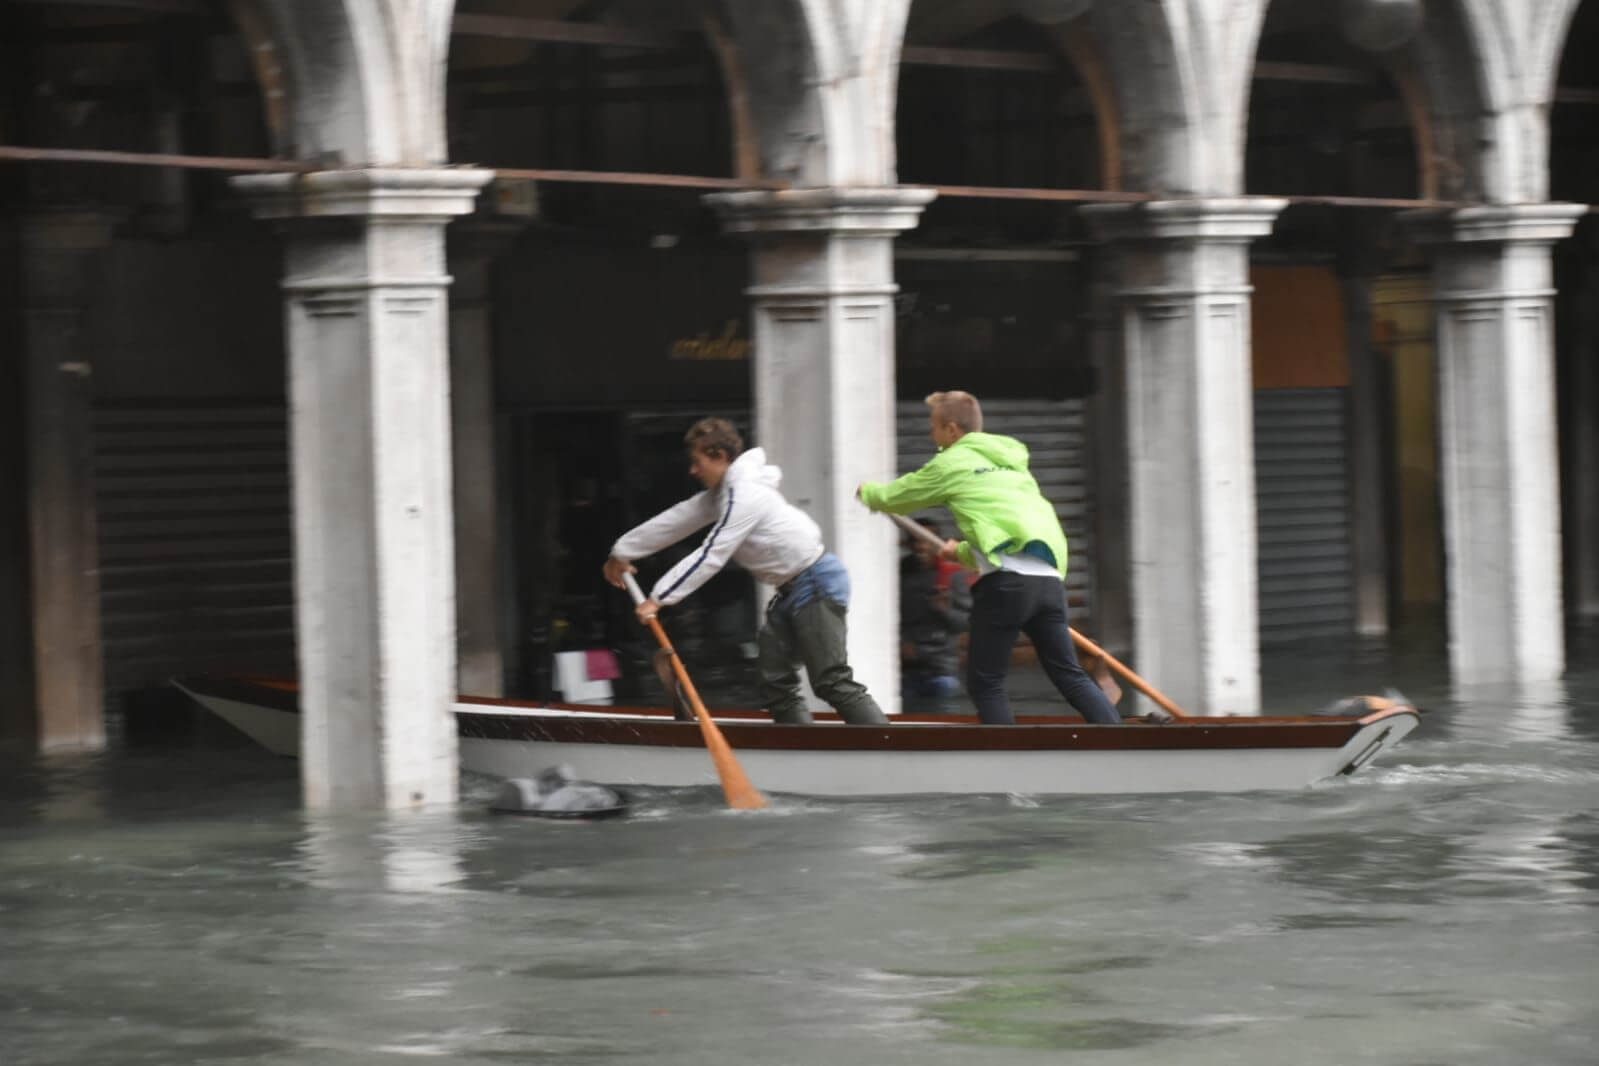 Wenecja, 29.10.2018. Fot. Comune di Venezia / Facebook